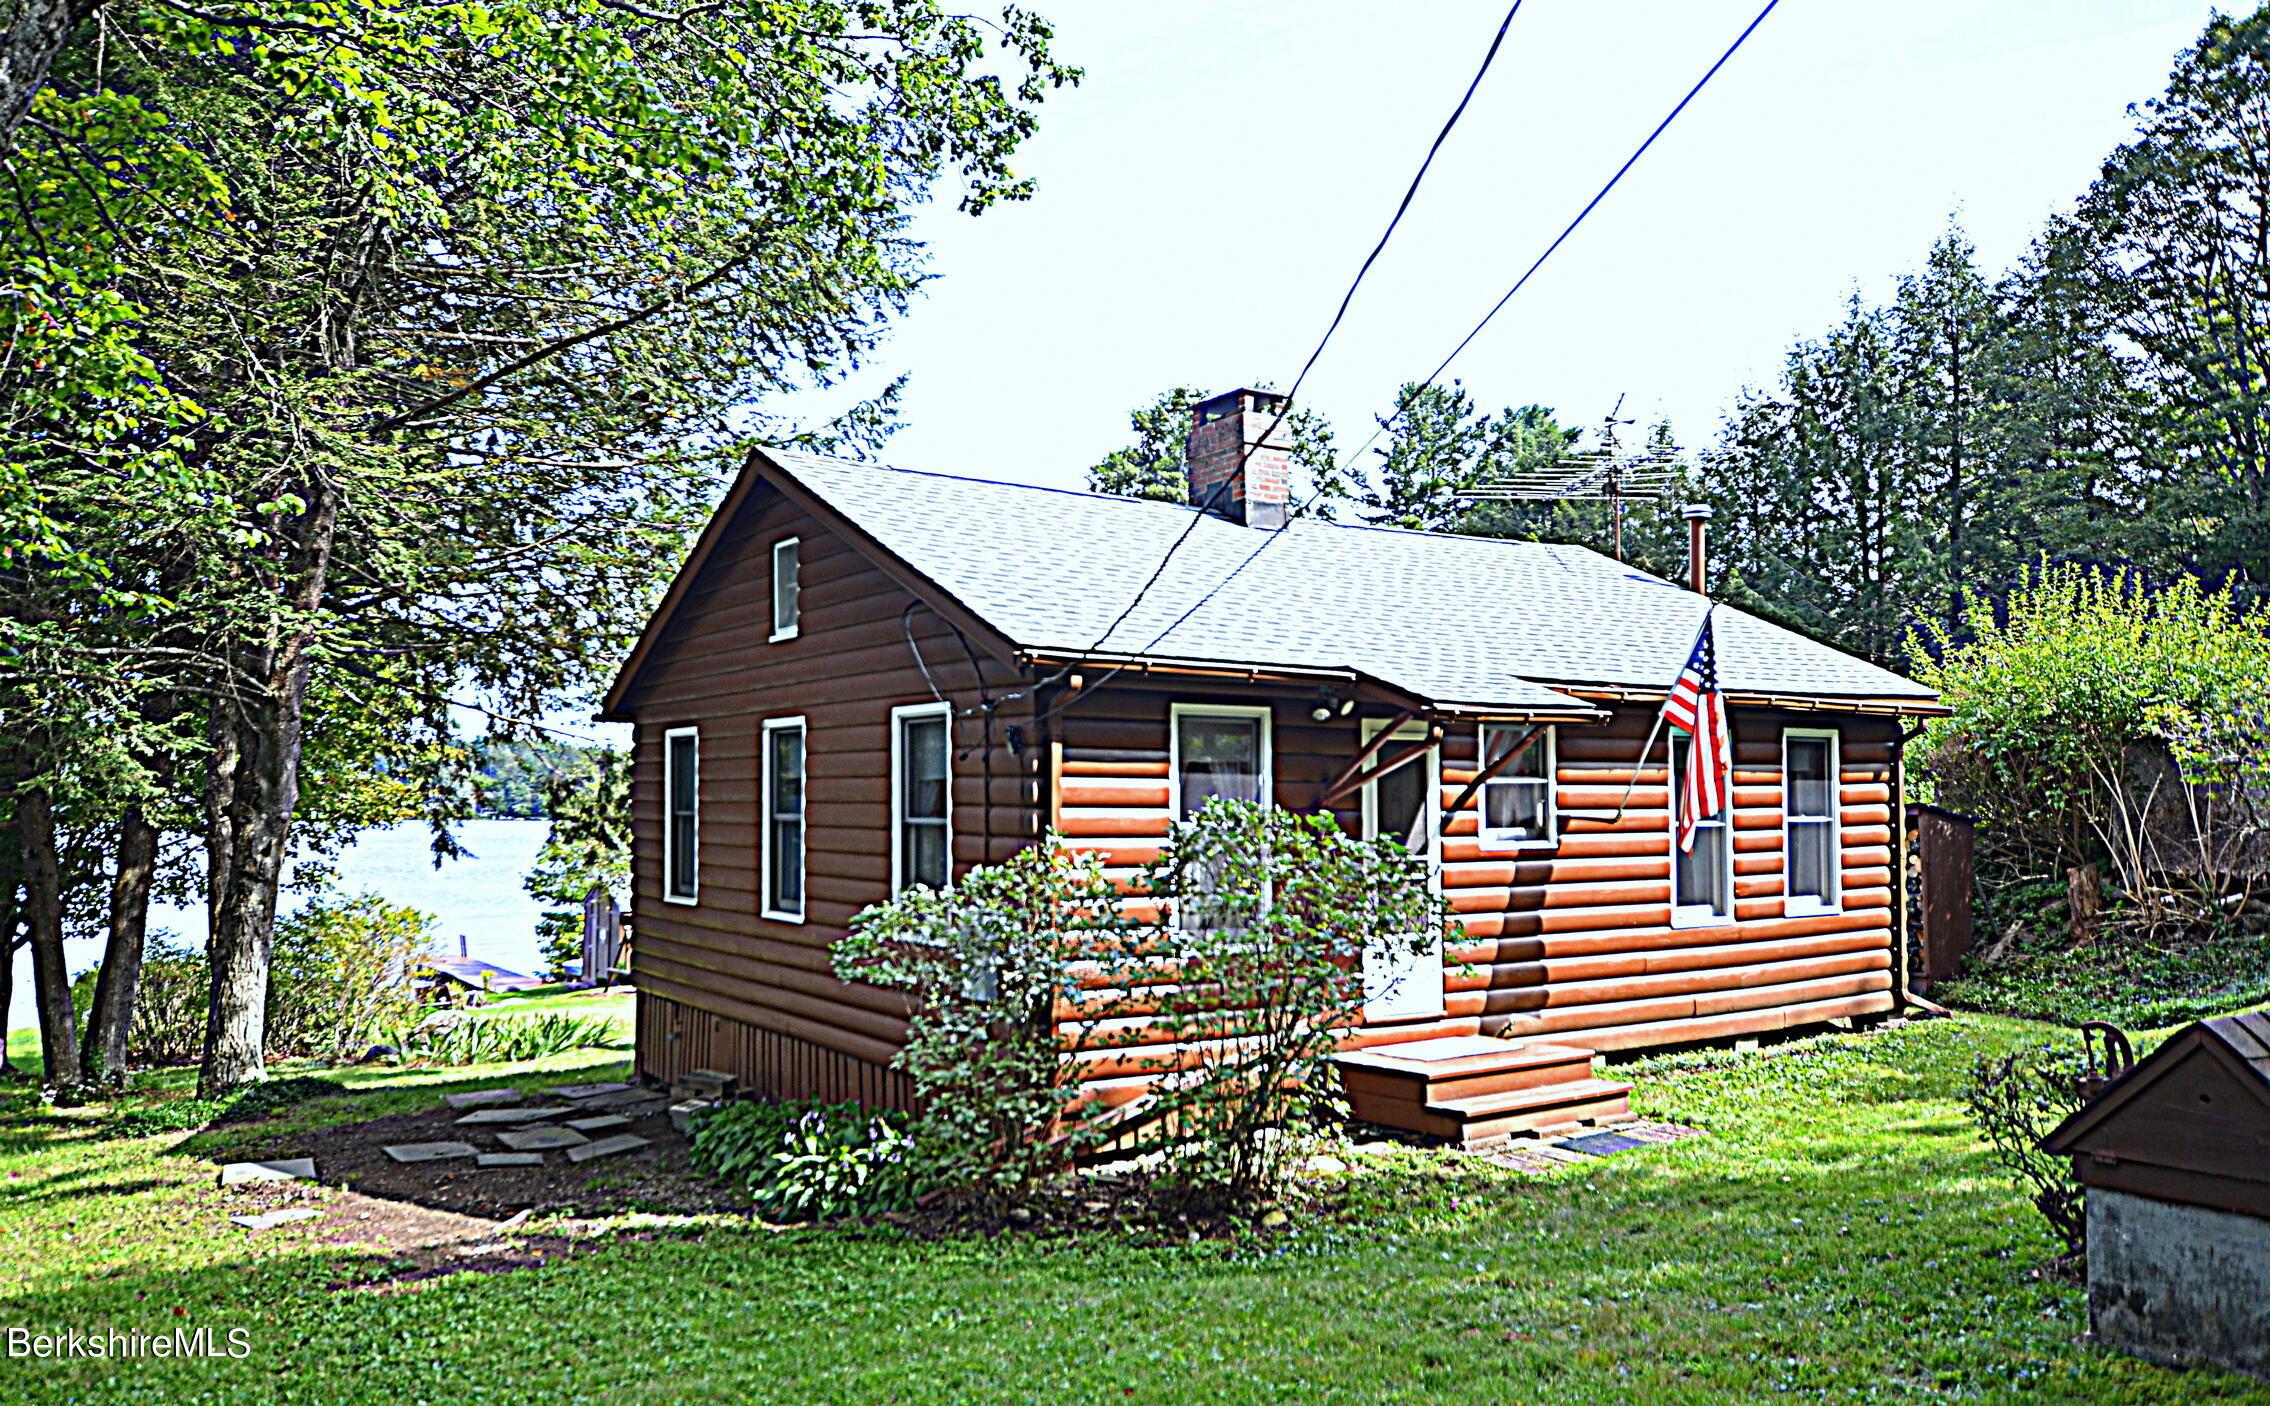 71 Flint Farm, Otis, Massachusetts 01253, 3 Bedrooms Bedrooms, 5 Rooms Rooms,1 BathroomBathrooms,Residential,For Sale,Flint Farm,235775